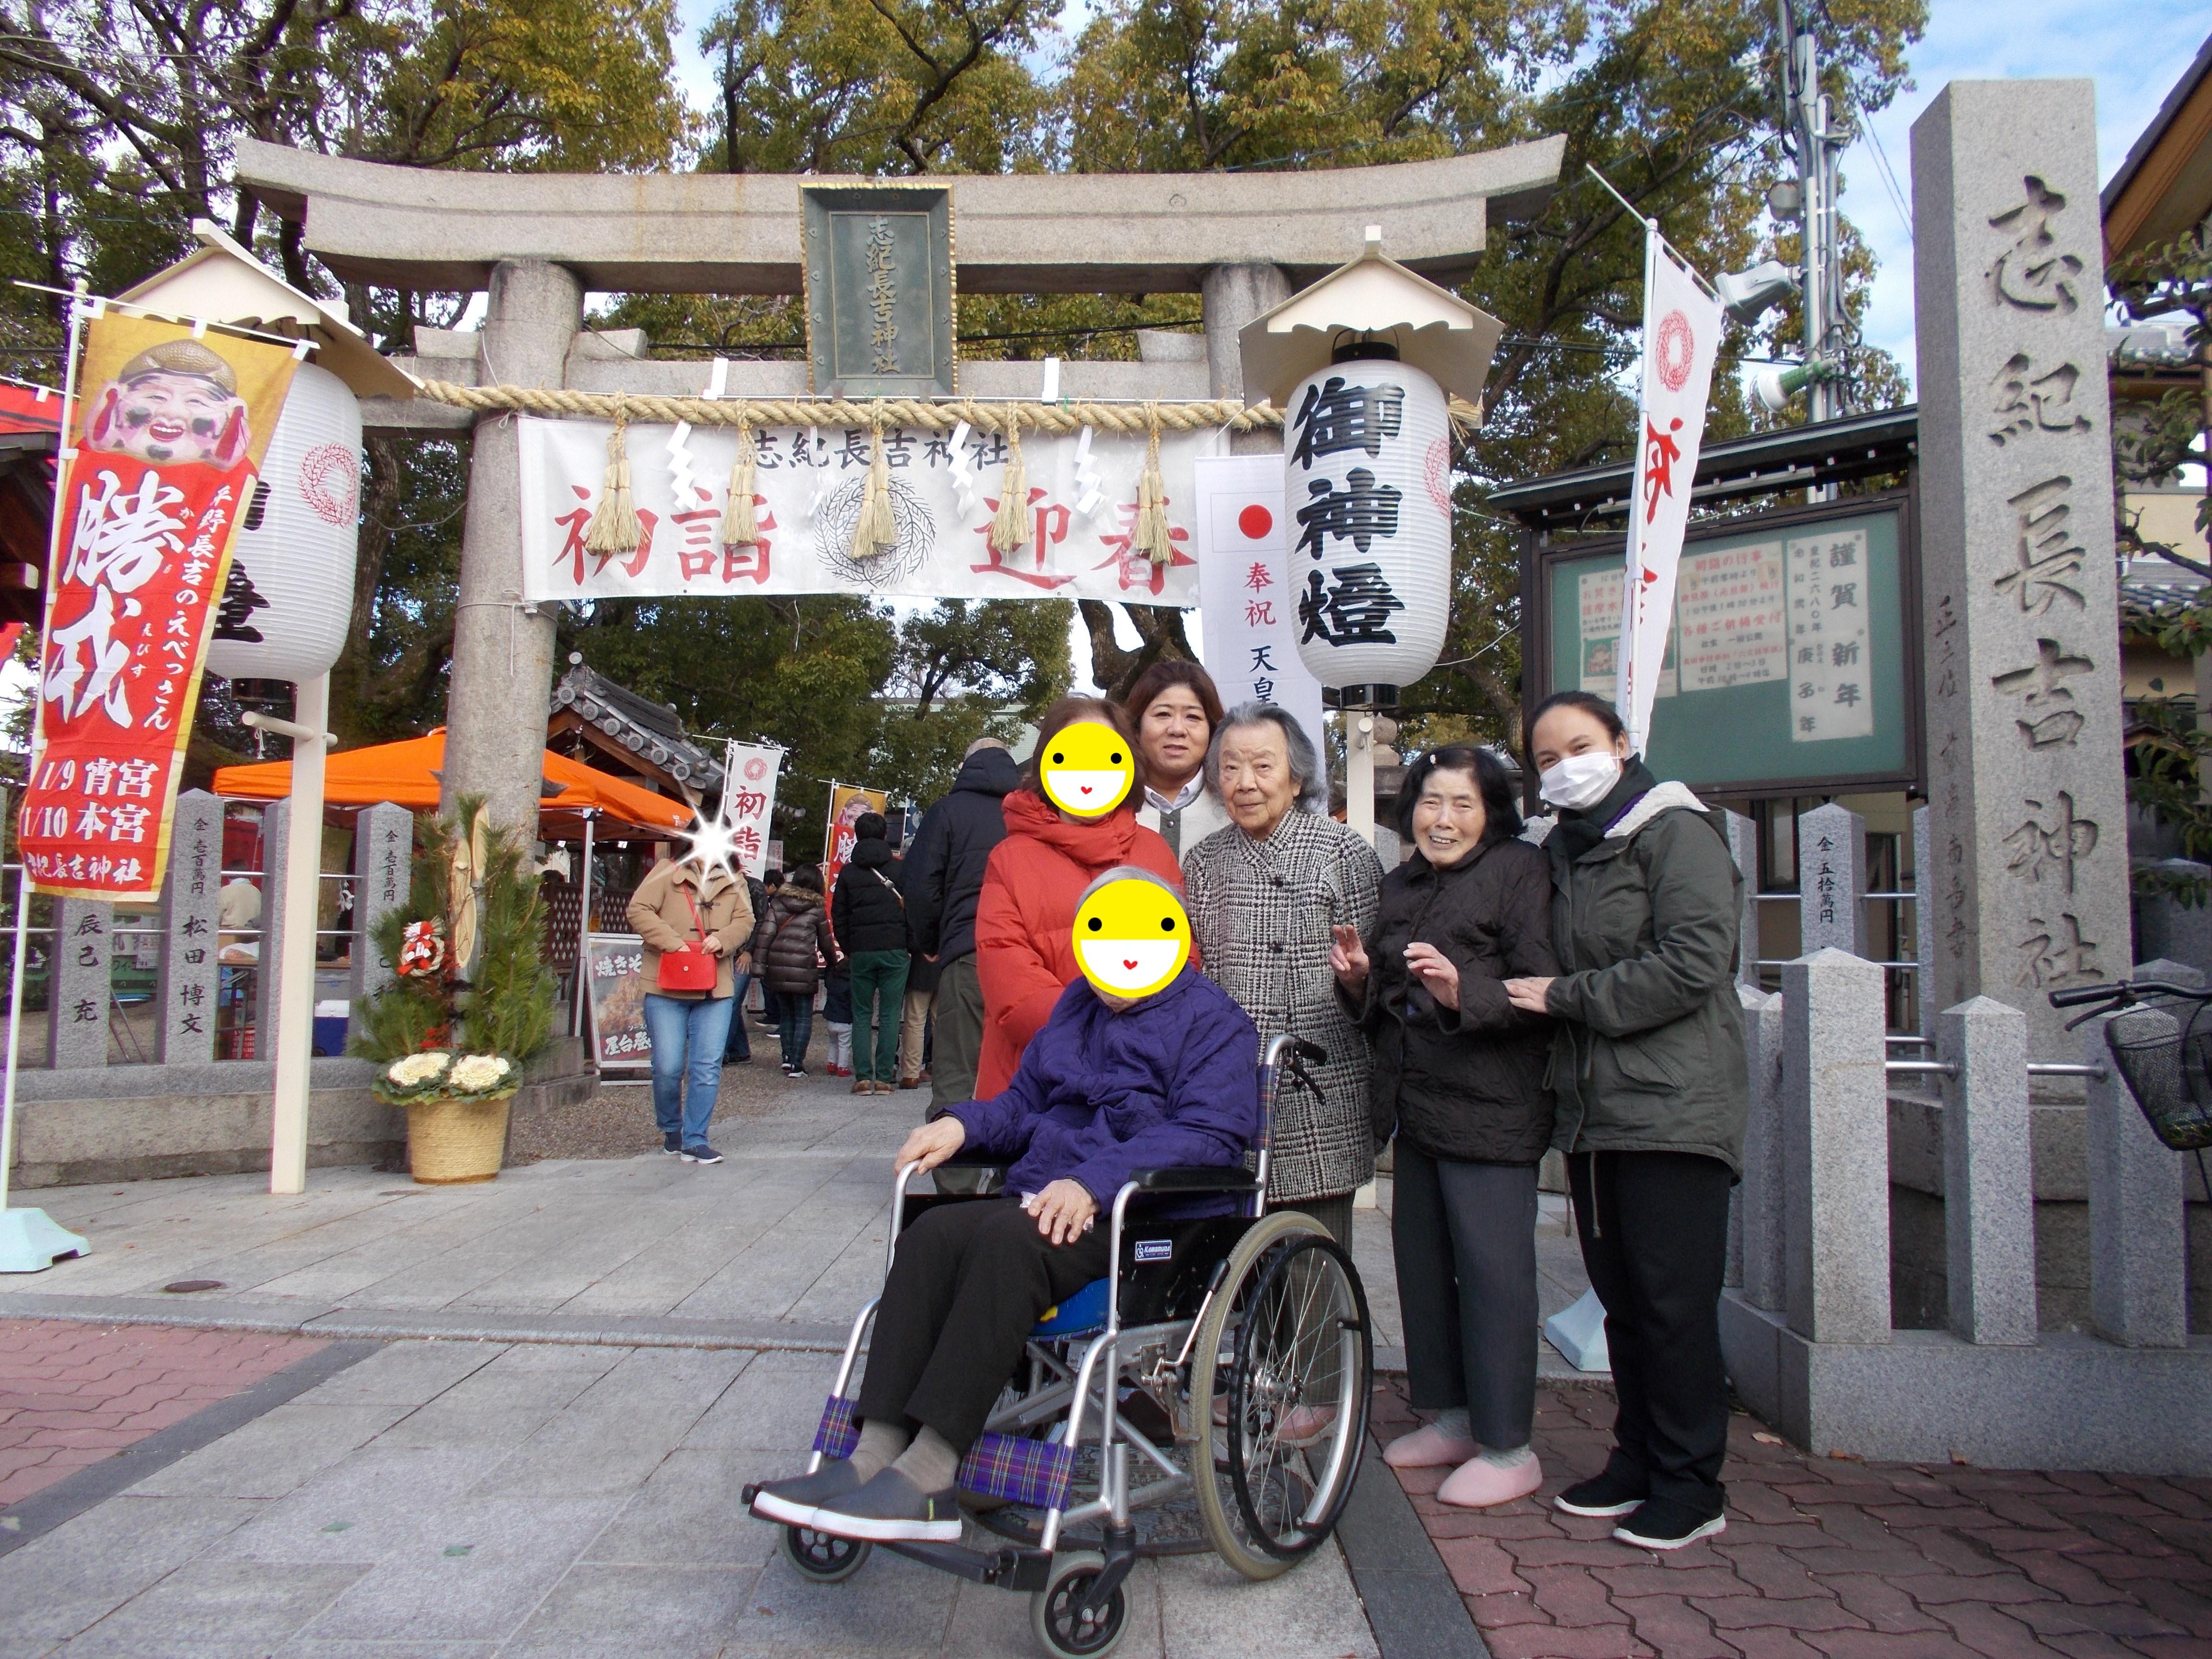 http://www.supercourt.jp/blog/hirano/202001015.JPG